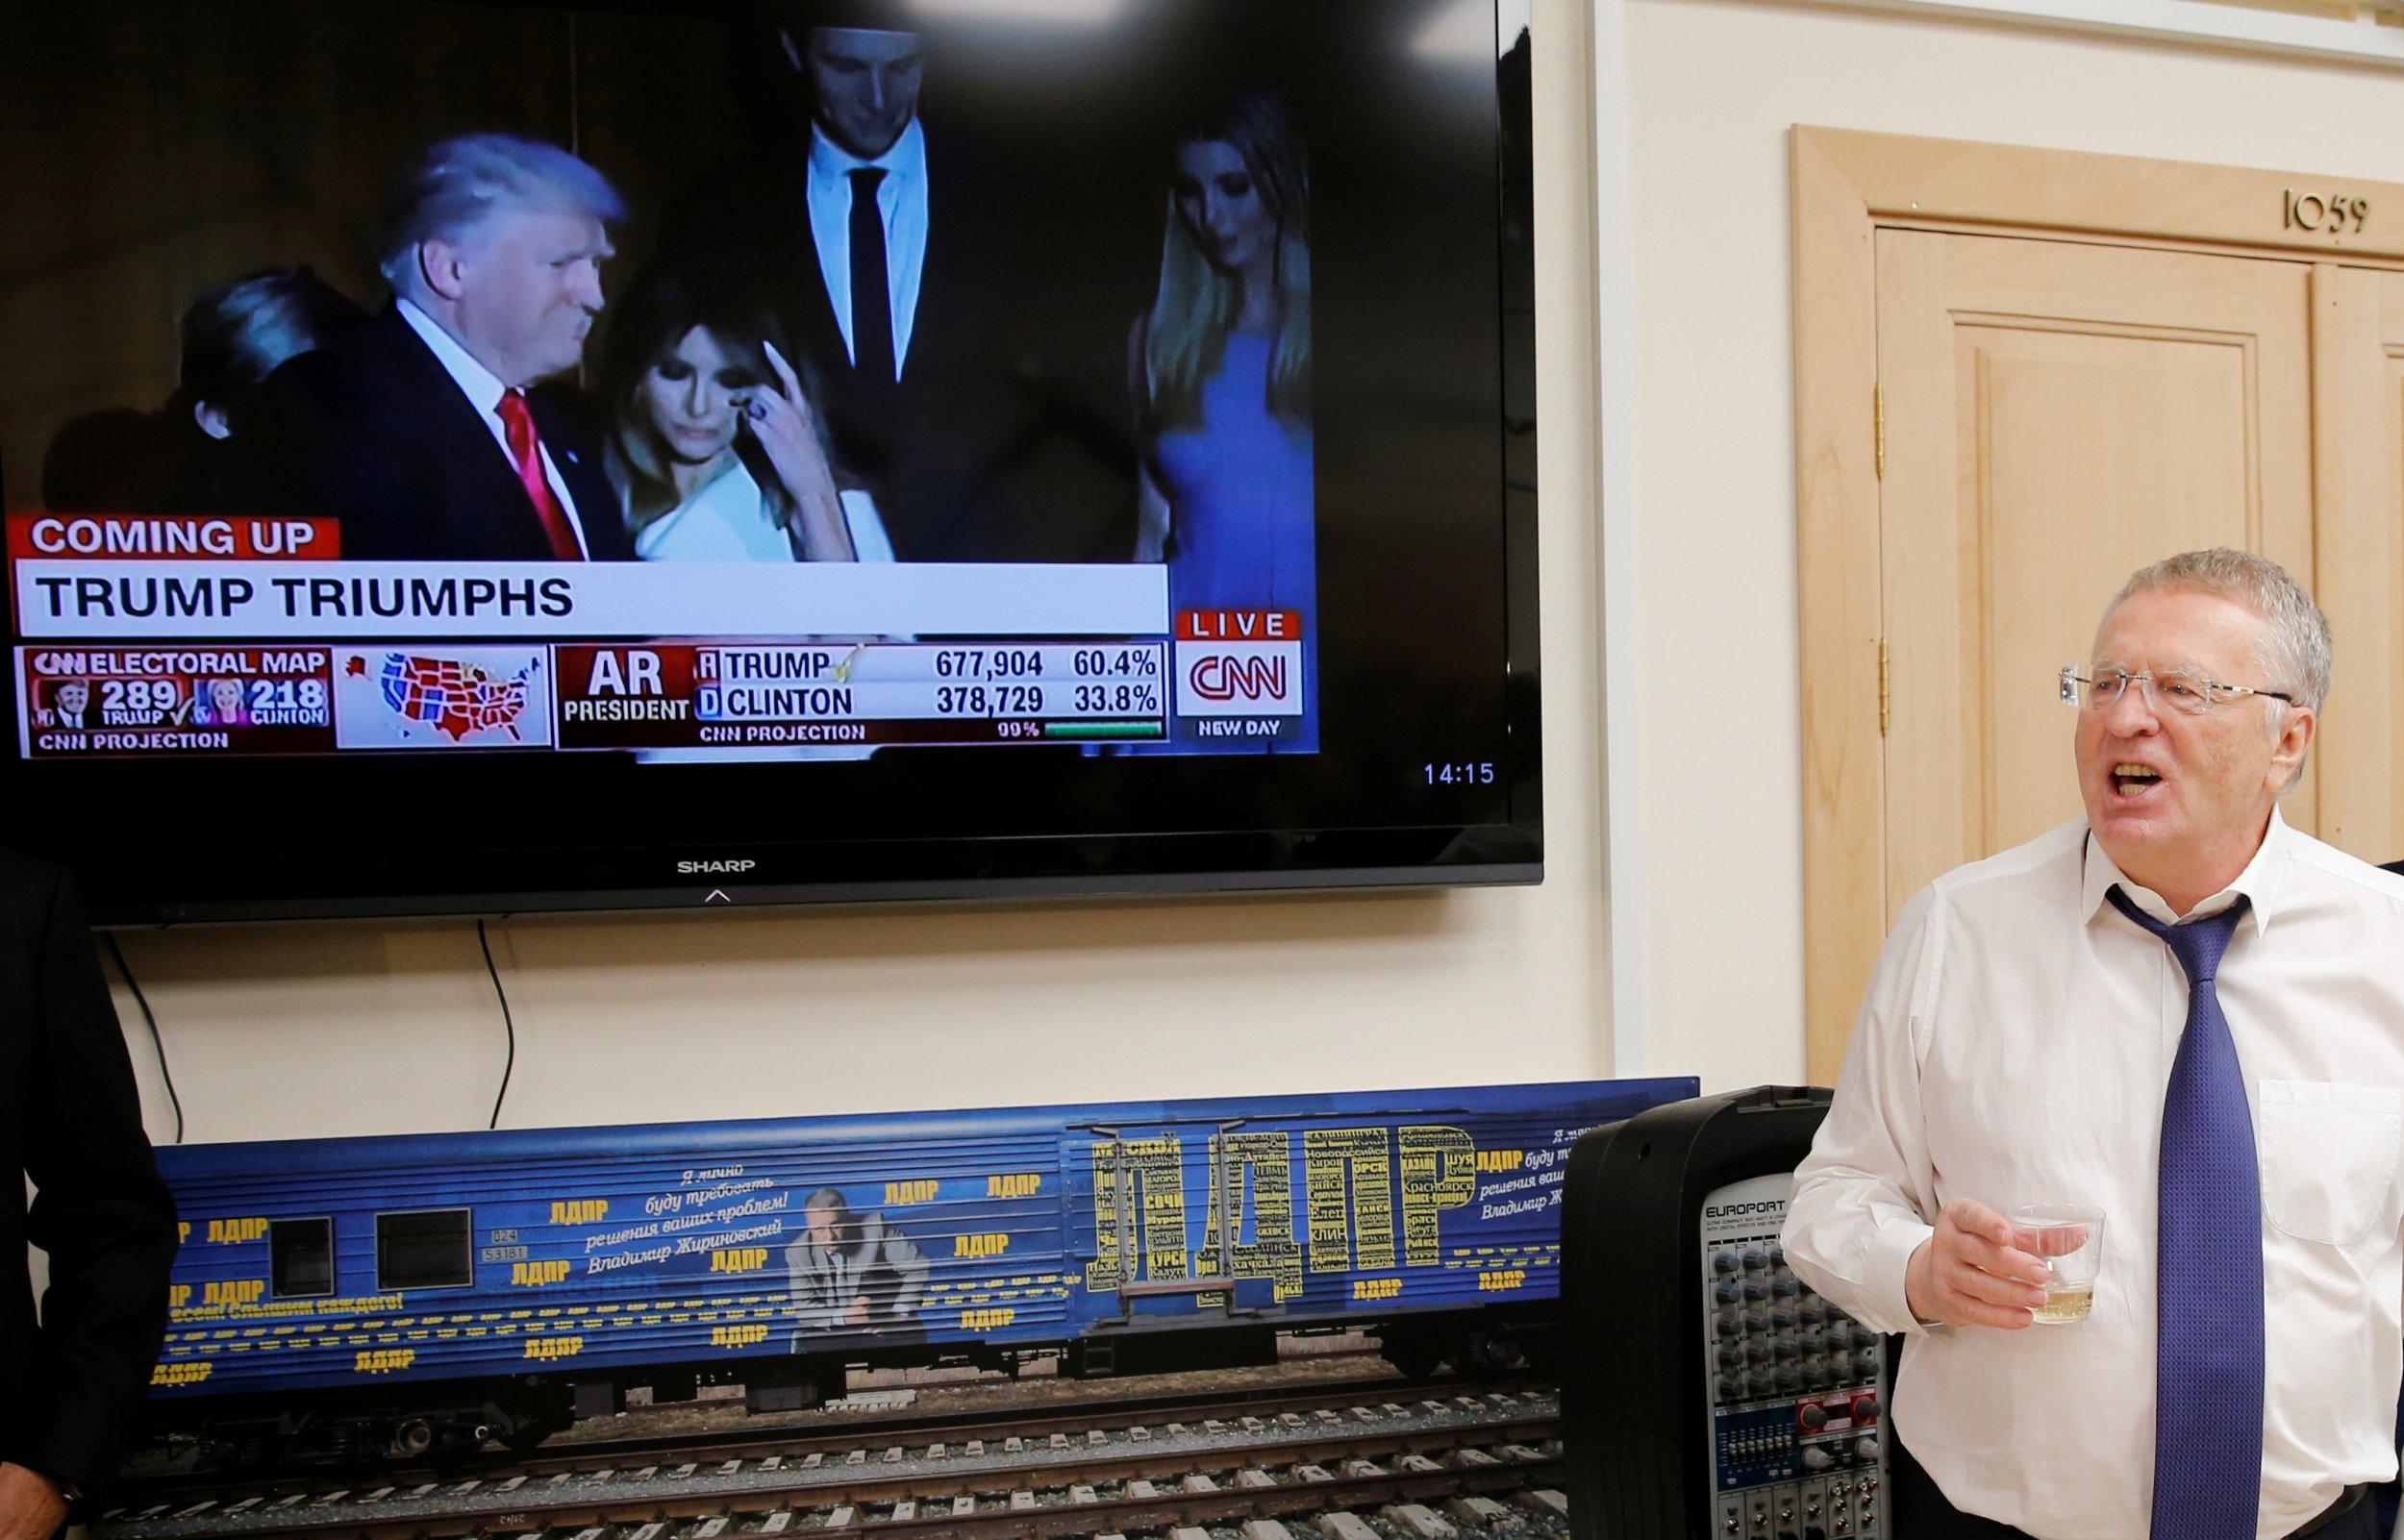 Trump on Russian tv